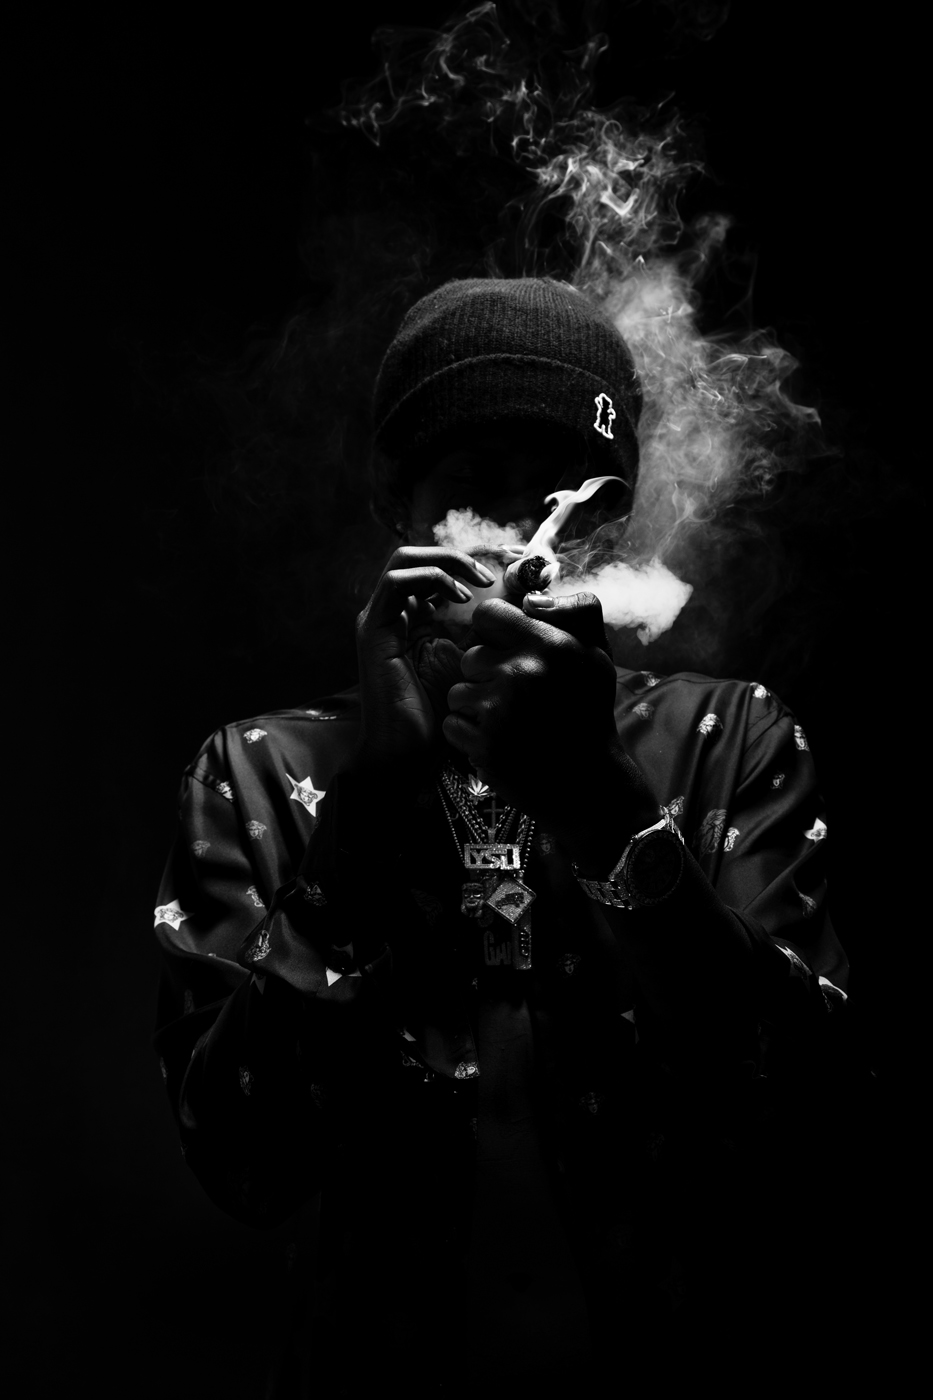 Justin_Hogan-Complex-Young_Thug-9.jpg